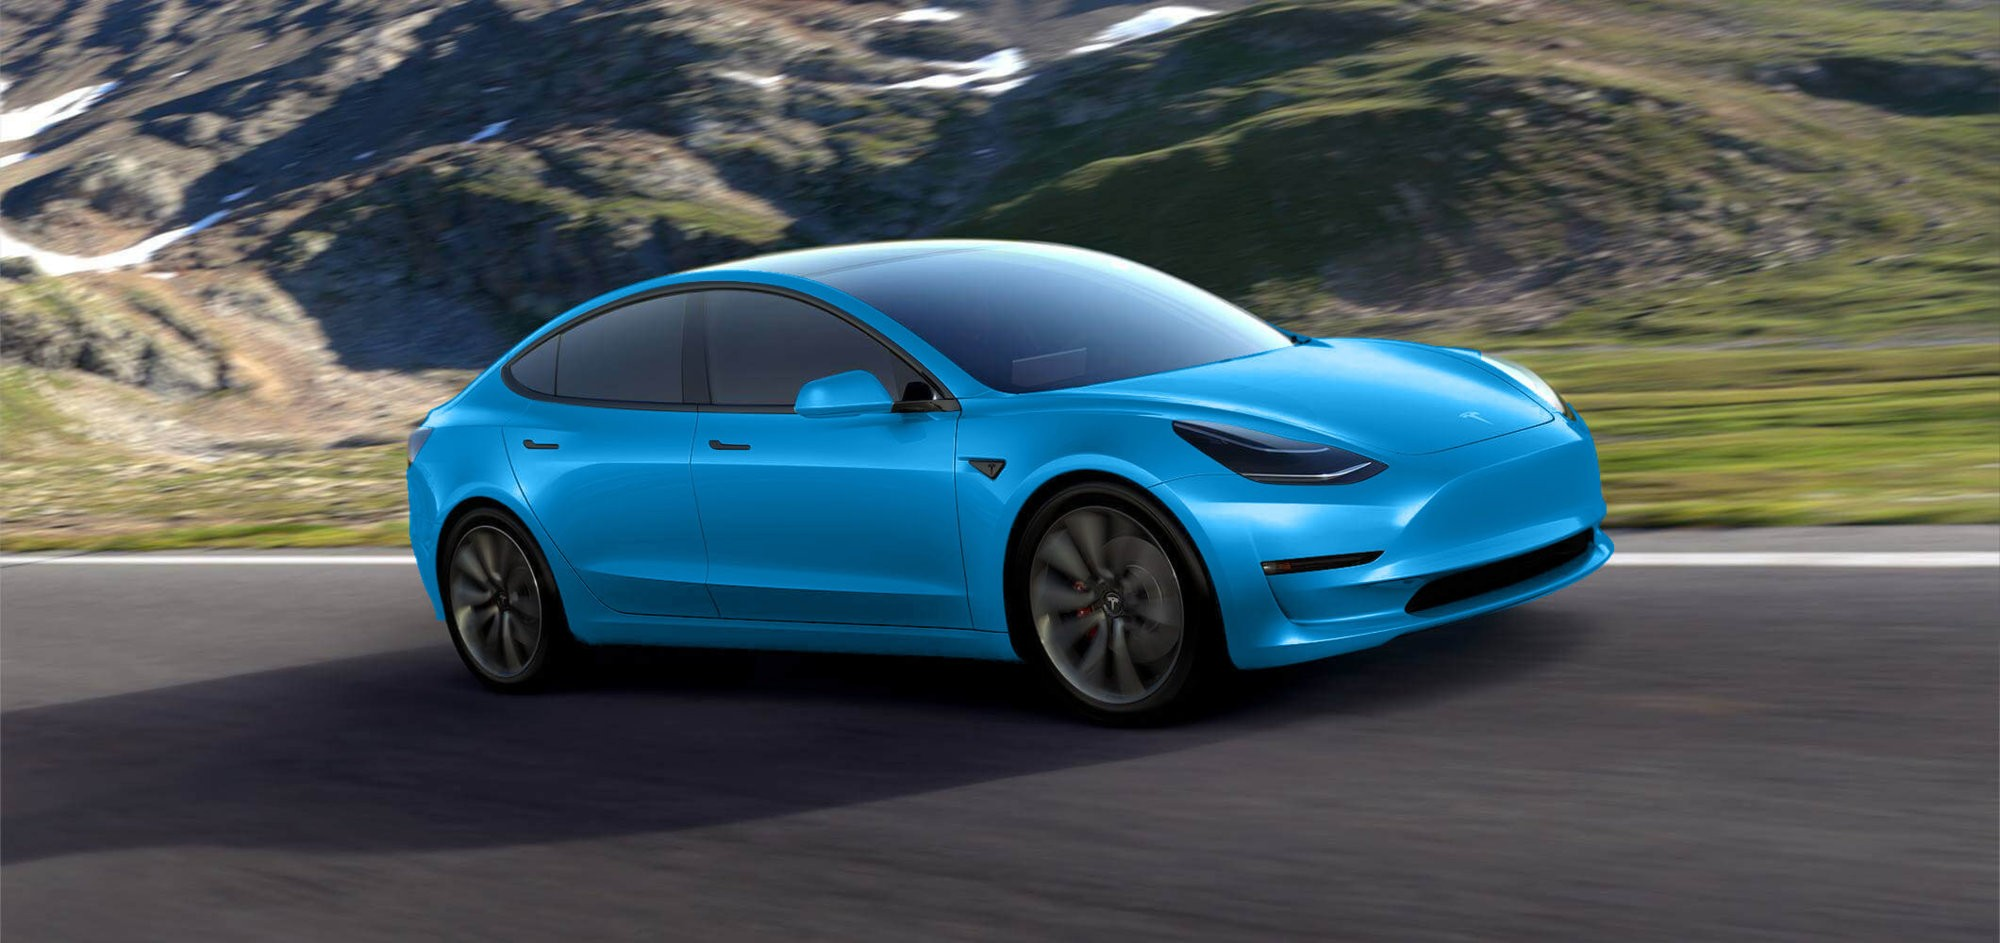 Elon Musk Car In Spac Wallpaper Tesla Model 3 Gets Rendered In Dozens Of Colors Looks